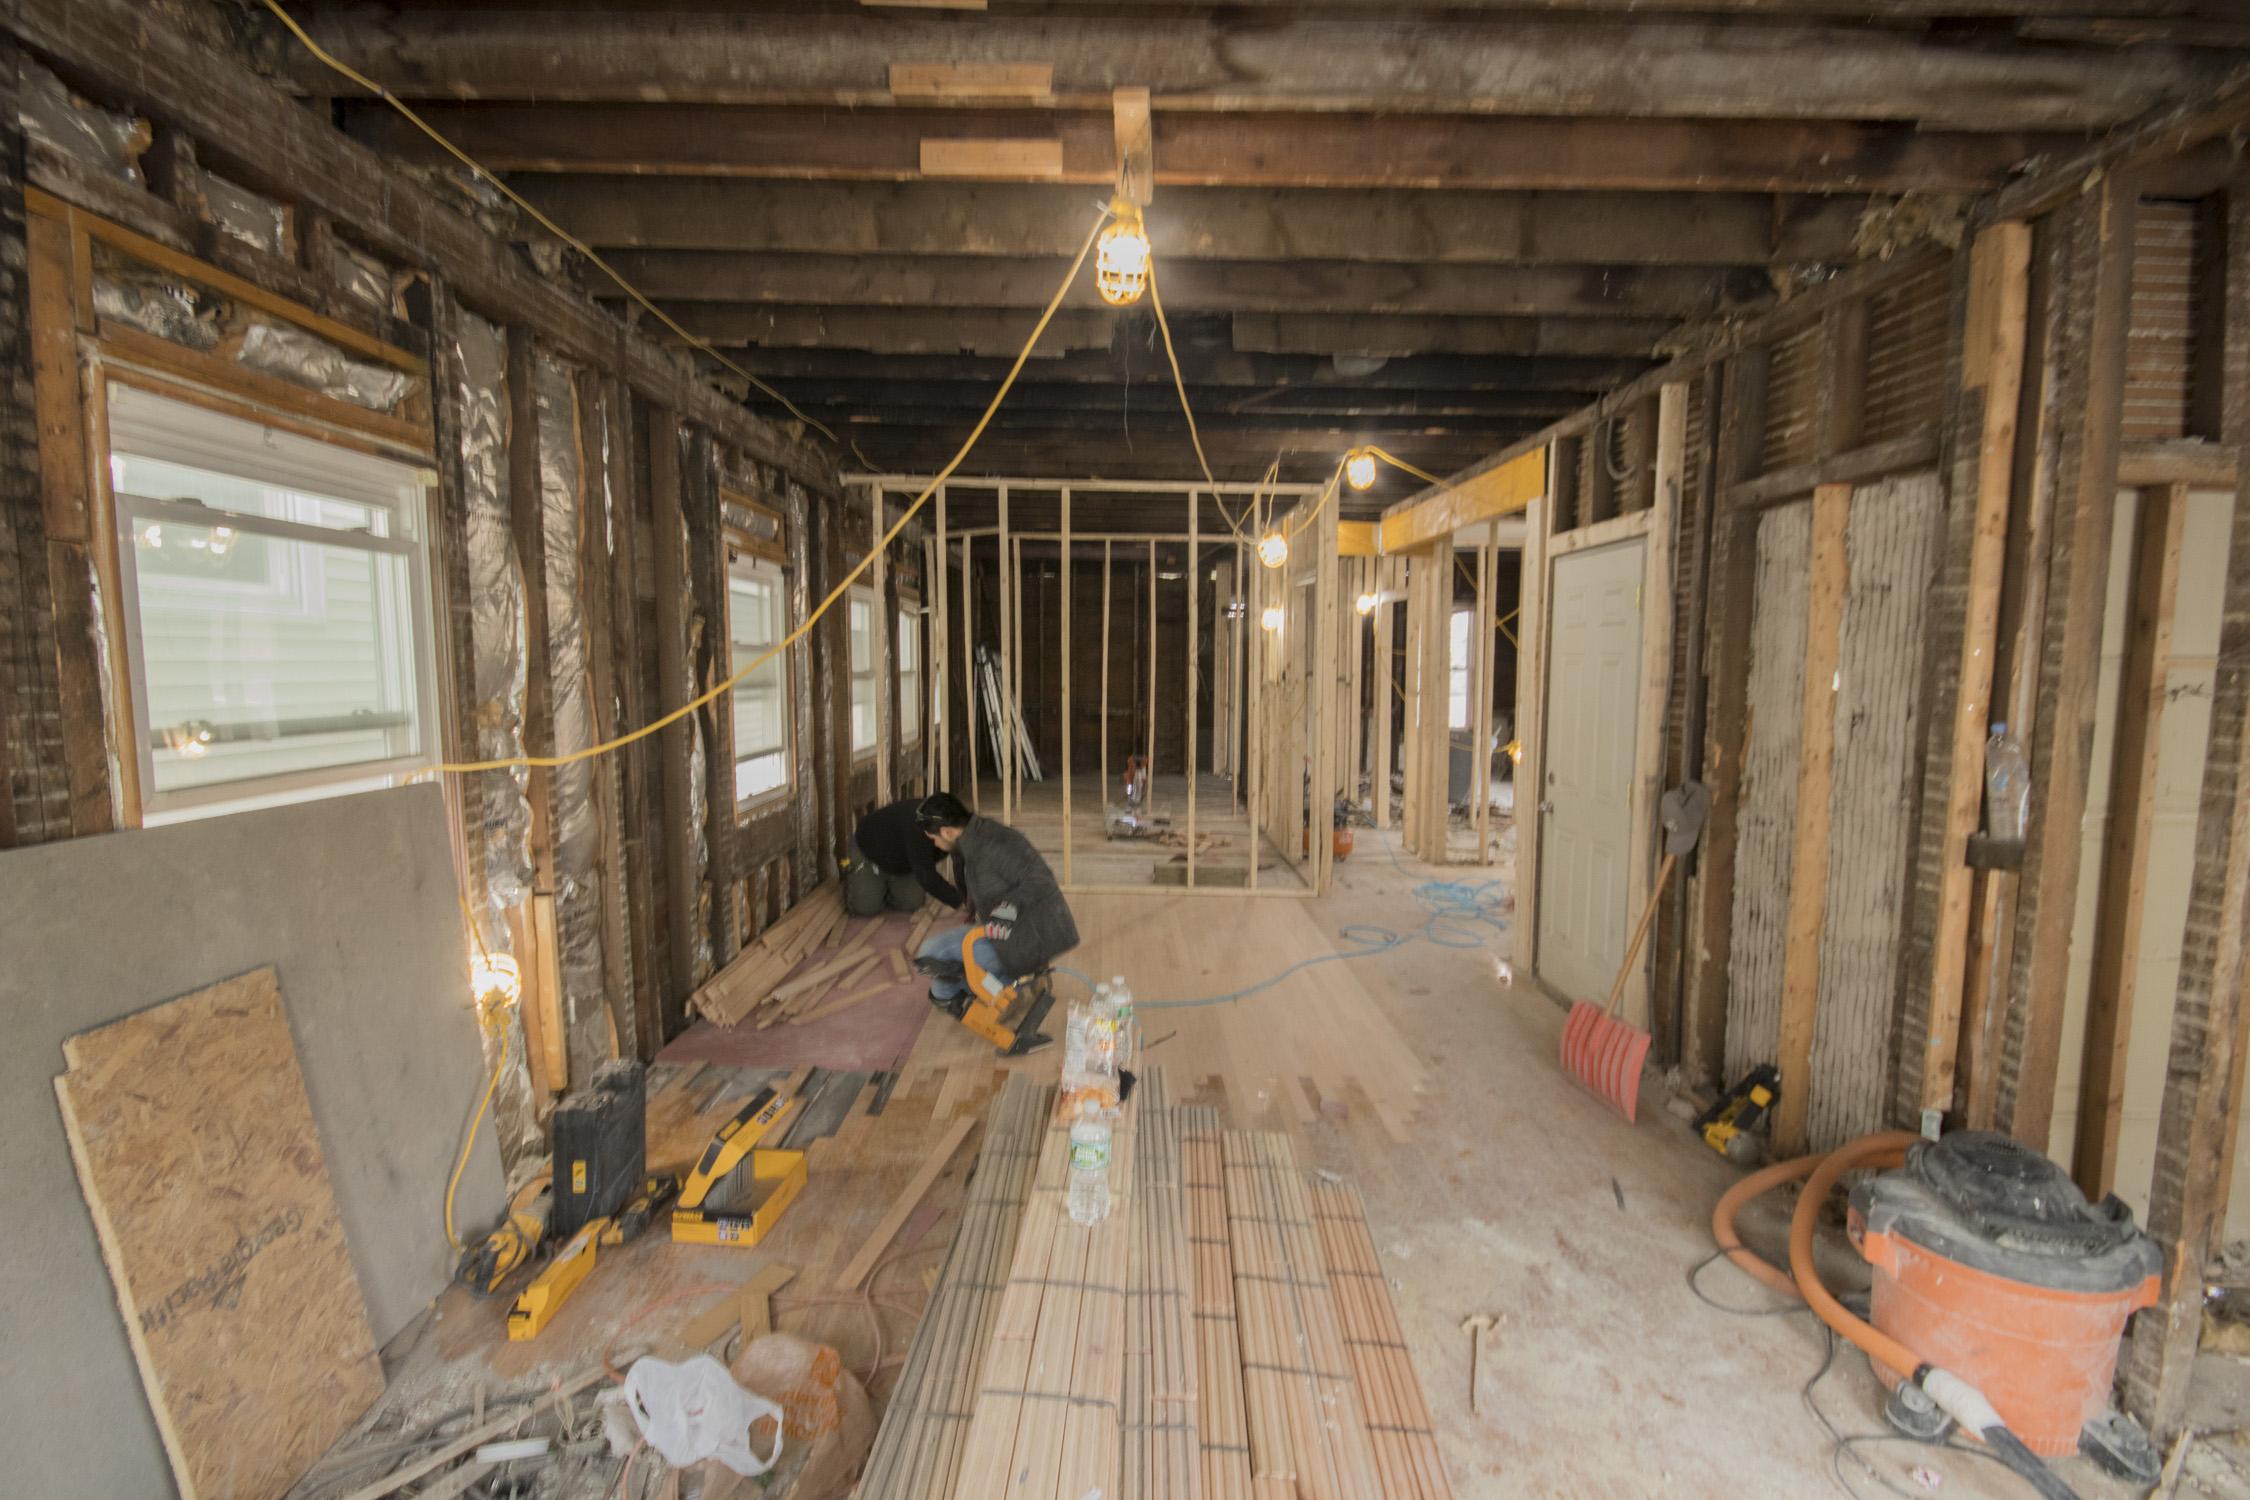 25 Darling St Boston General Contractors P Northeast Contractors_22